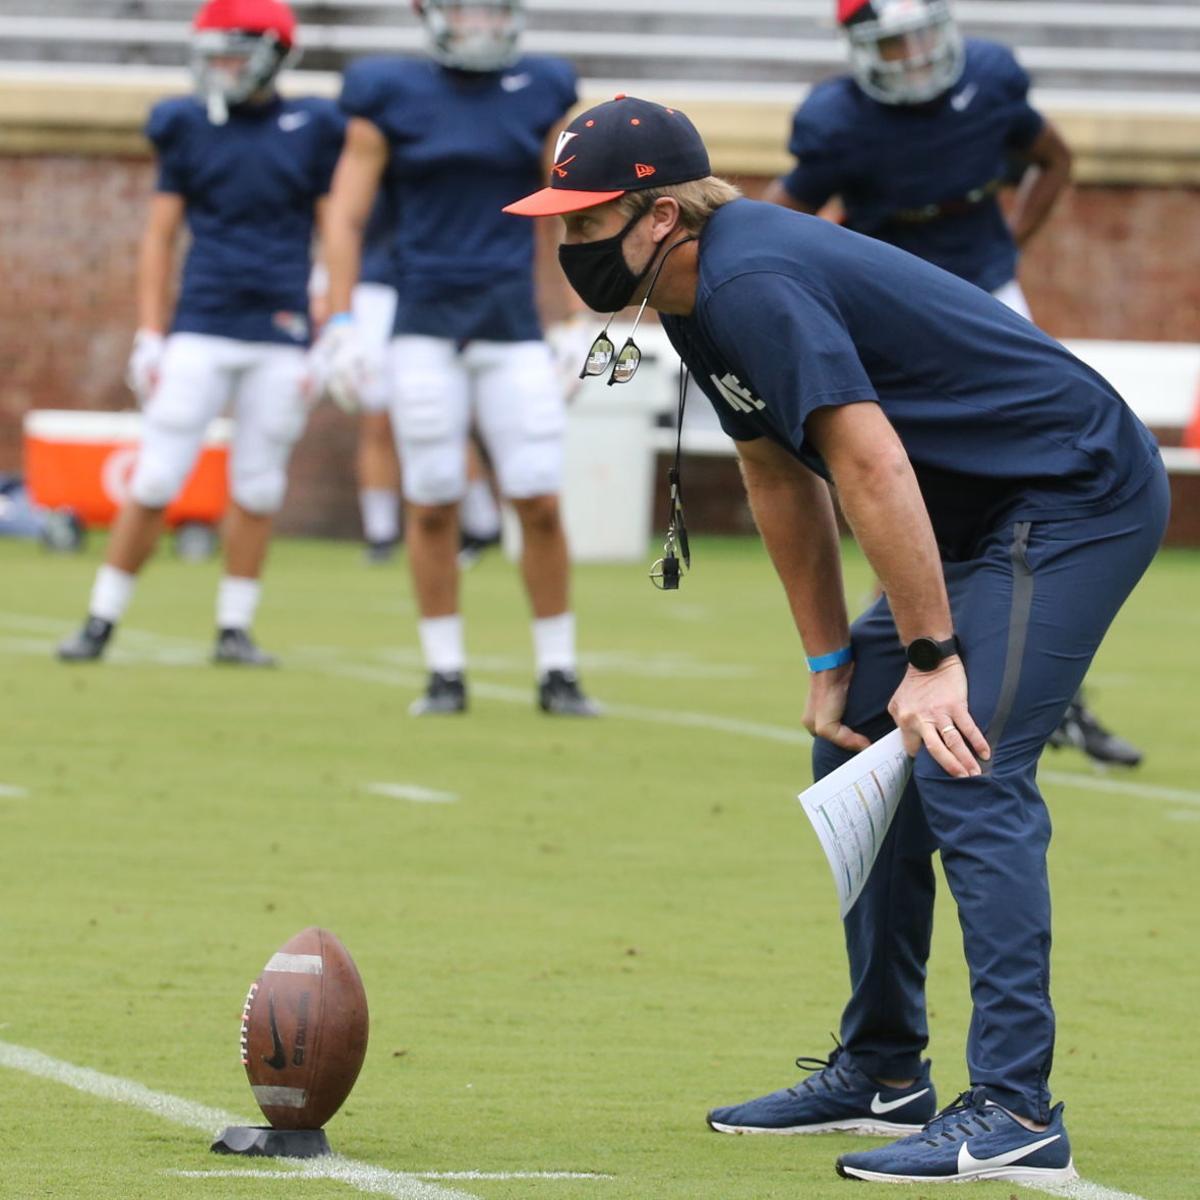 Mendenhall Virginia Will Likely Open Football Season At Virginia Tech Sports Dailyprogress Com